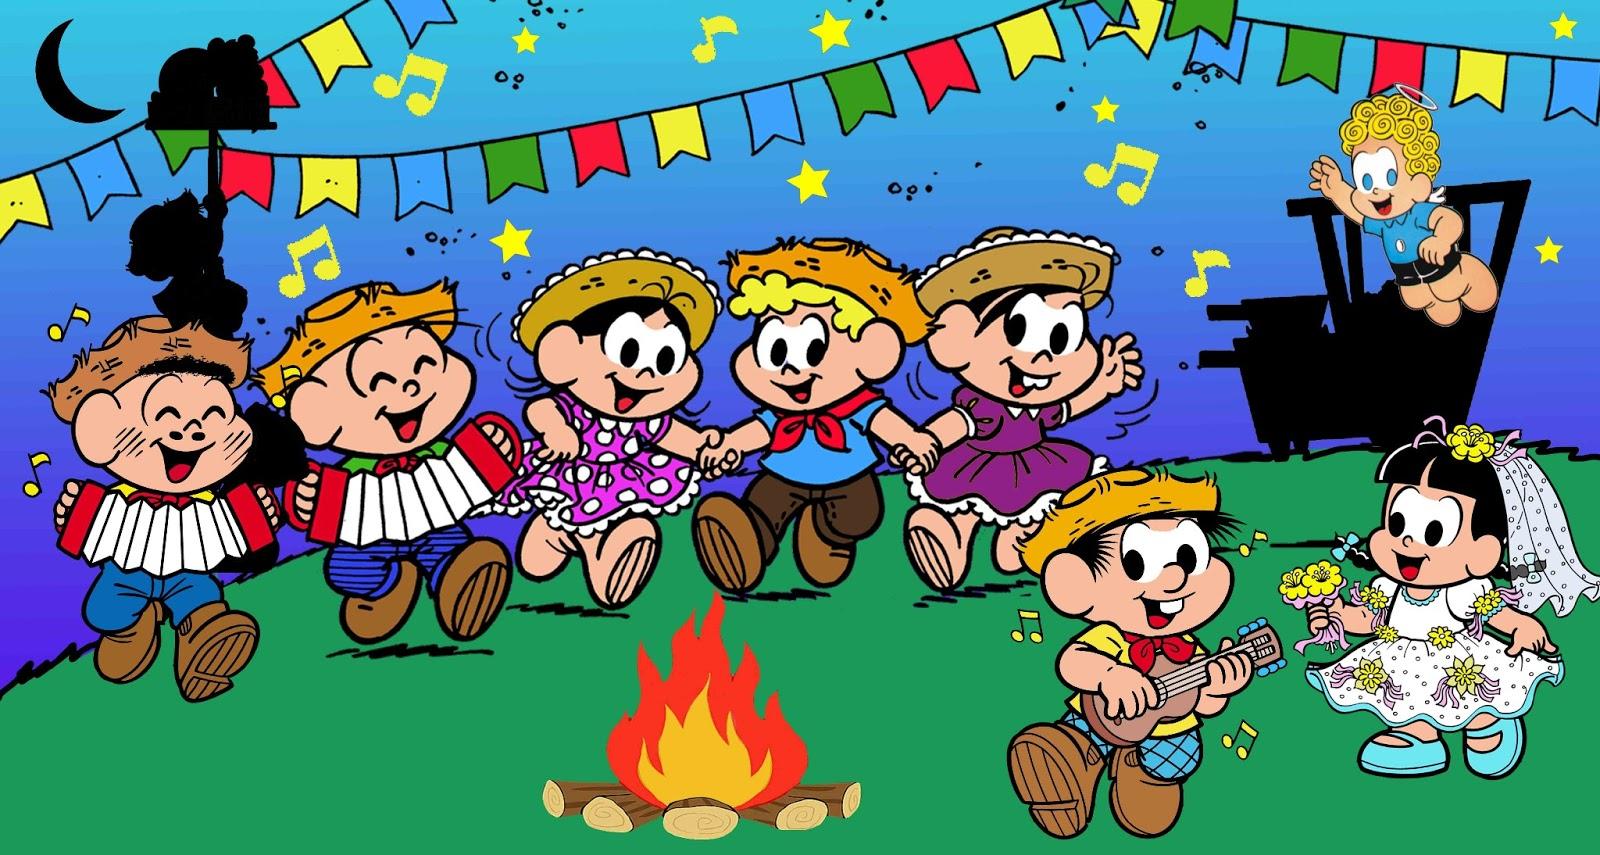 Total Flex Festas Junina A Tradicional Festa Caipira Do Brasil